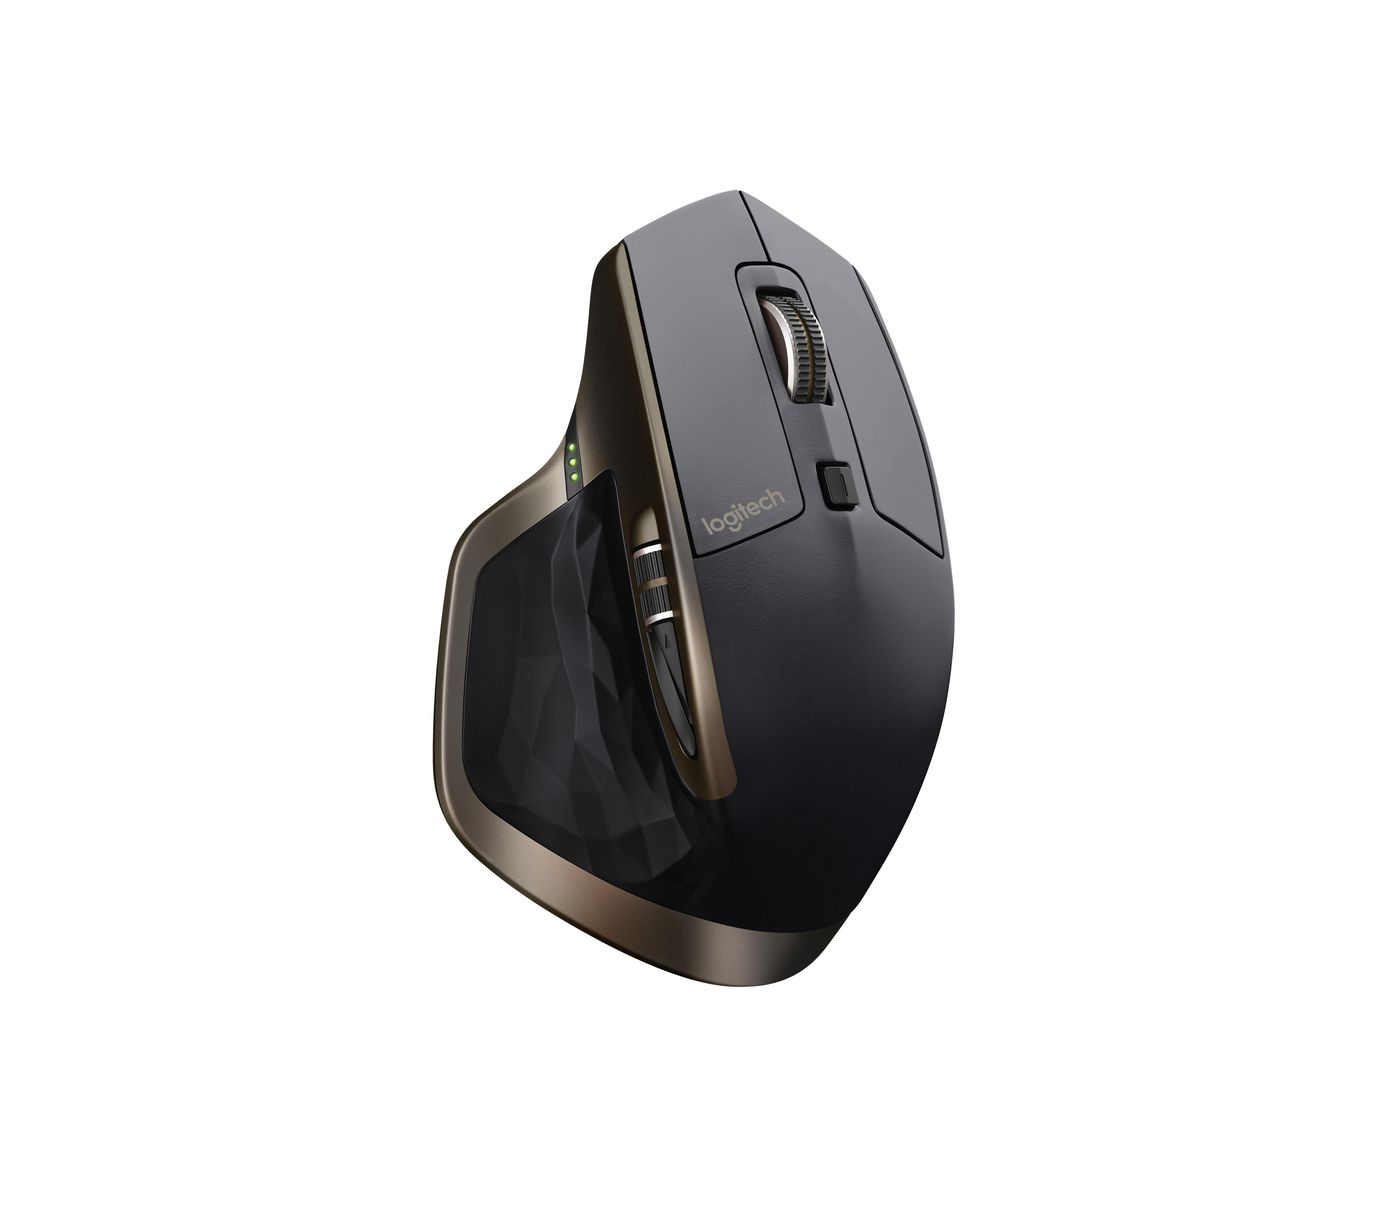 Logitech 910-004362 MX Master Mouse